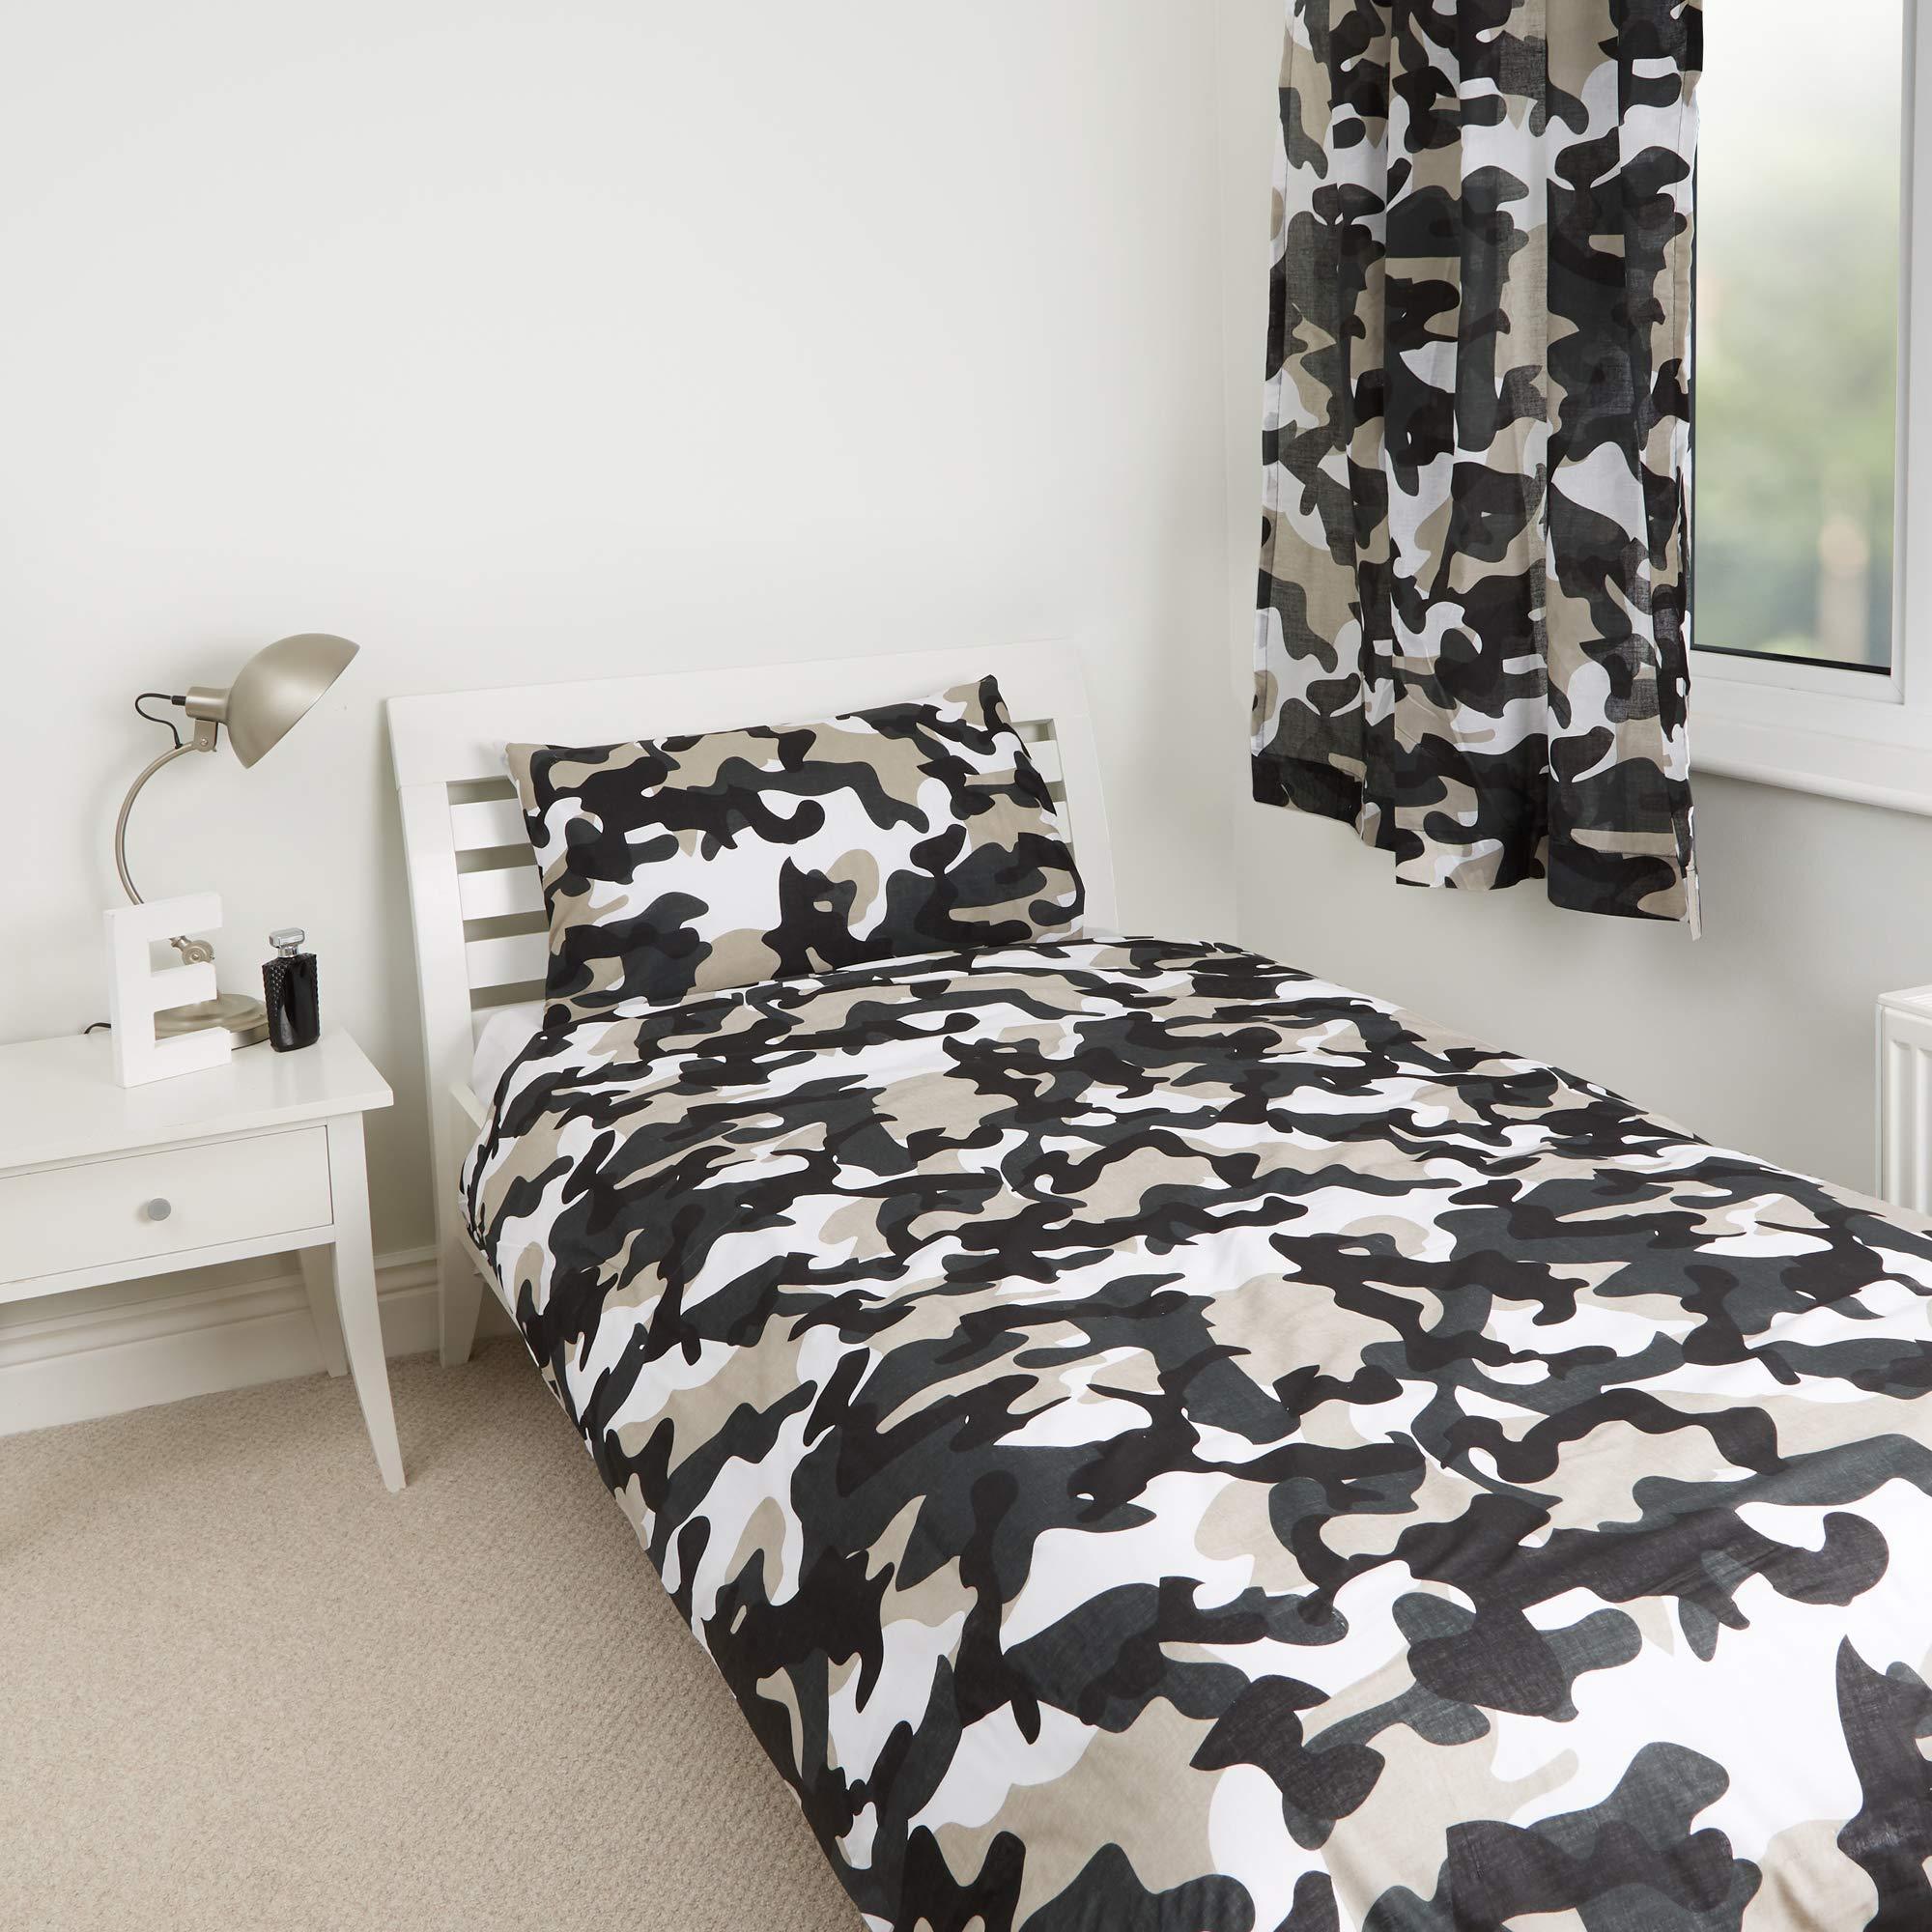 Grey Camo Camouflage Design Kids Boys Girls Bedroom Duvet Cover Bedding Range 54 Curtains Buy Online In Grenada At Grenada Desertcart Com Productid 53718473